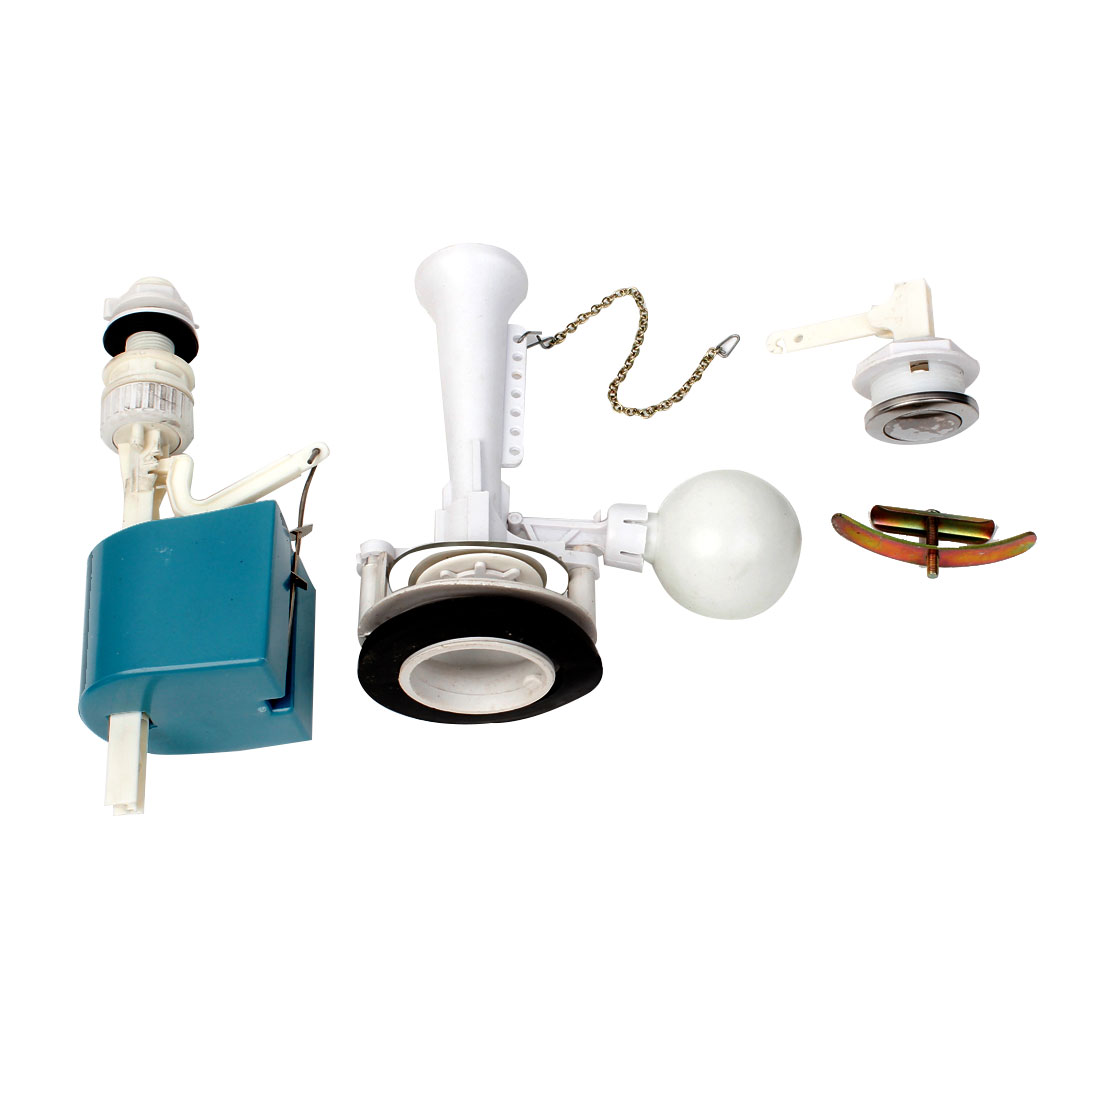 Universal Single Flush Toilet Cistern Inlet Outlet Valve Push Button Sets